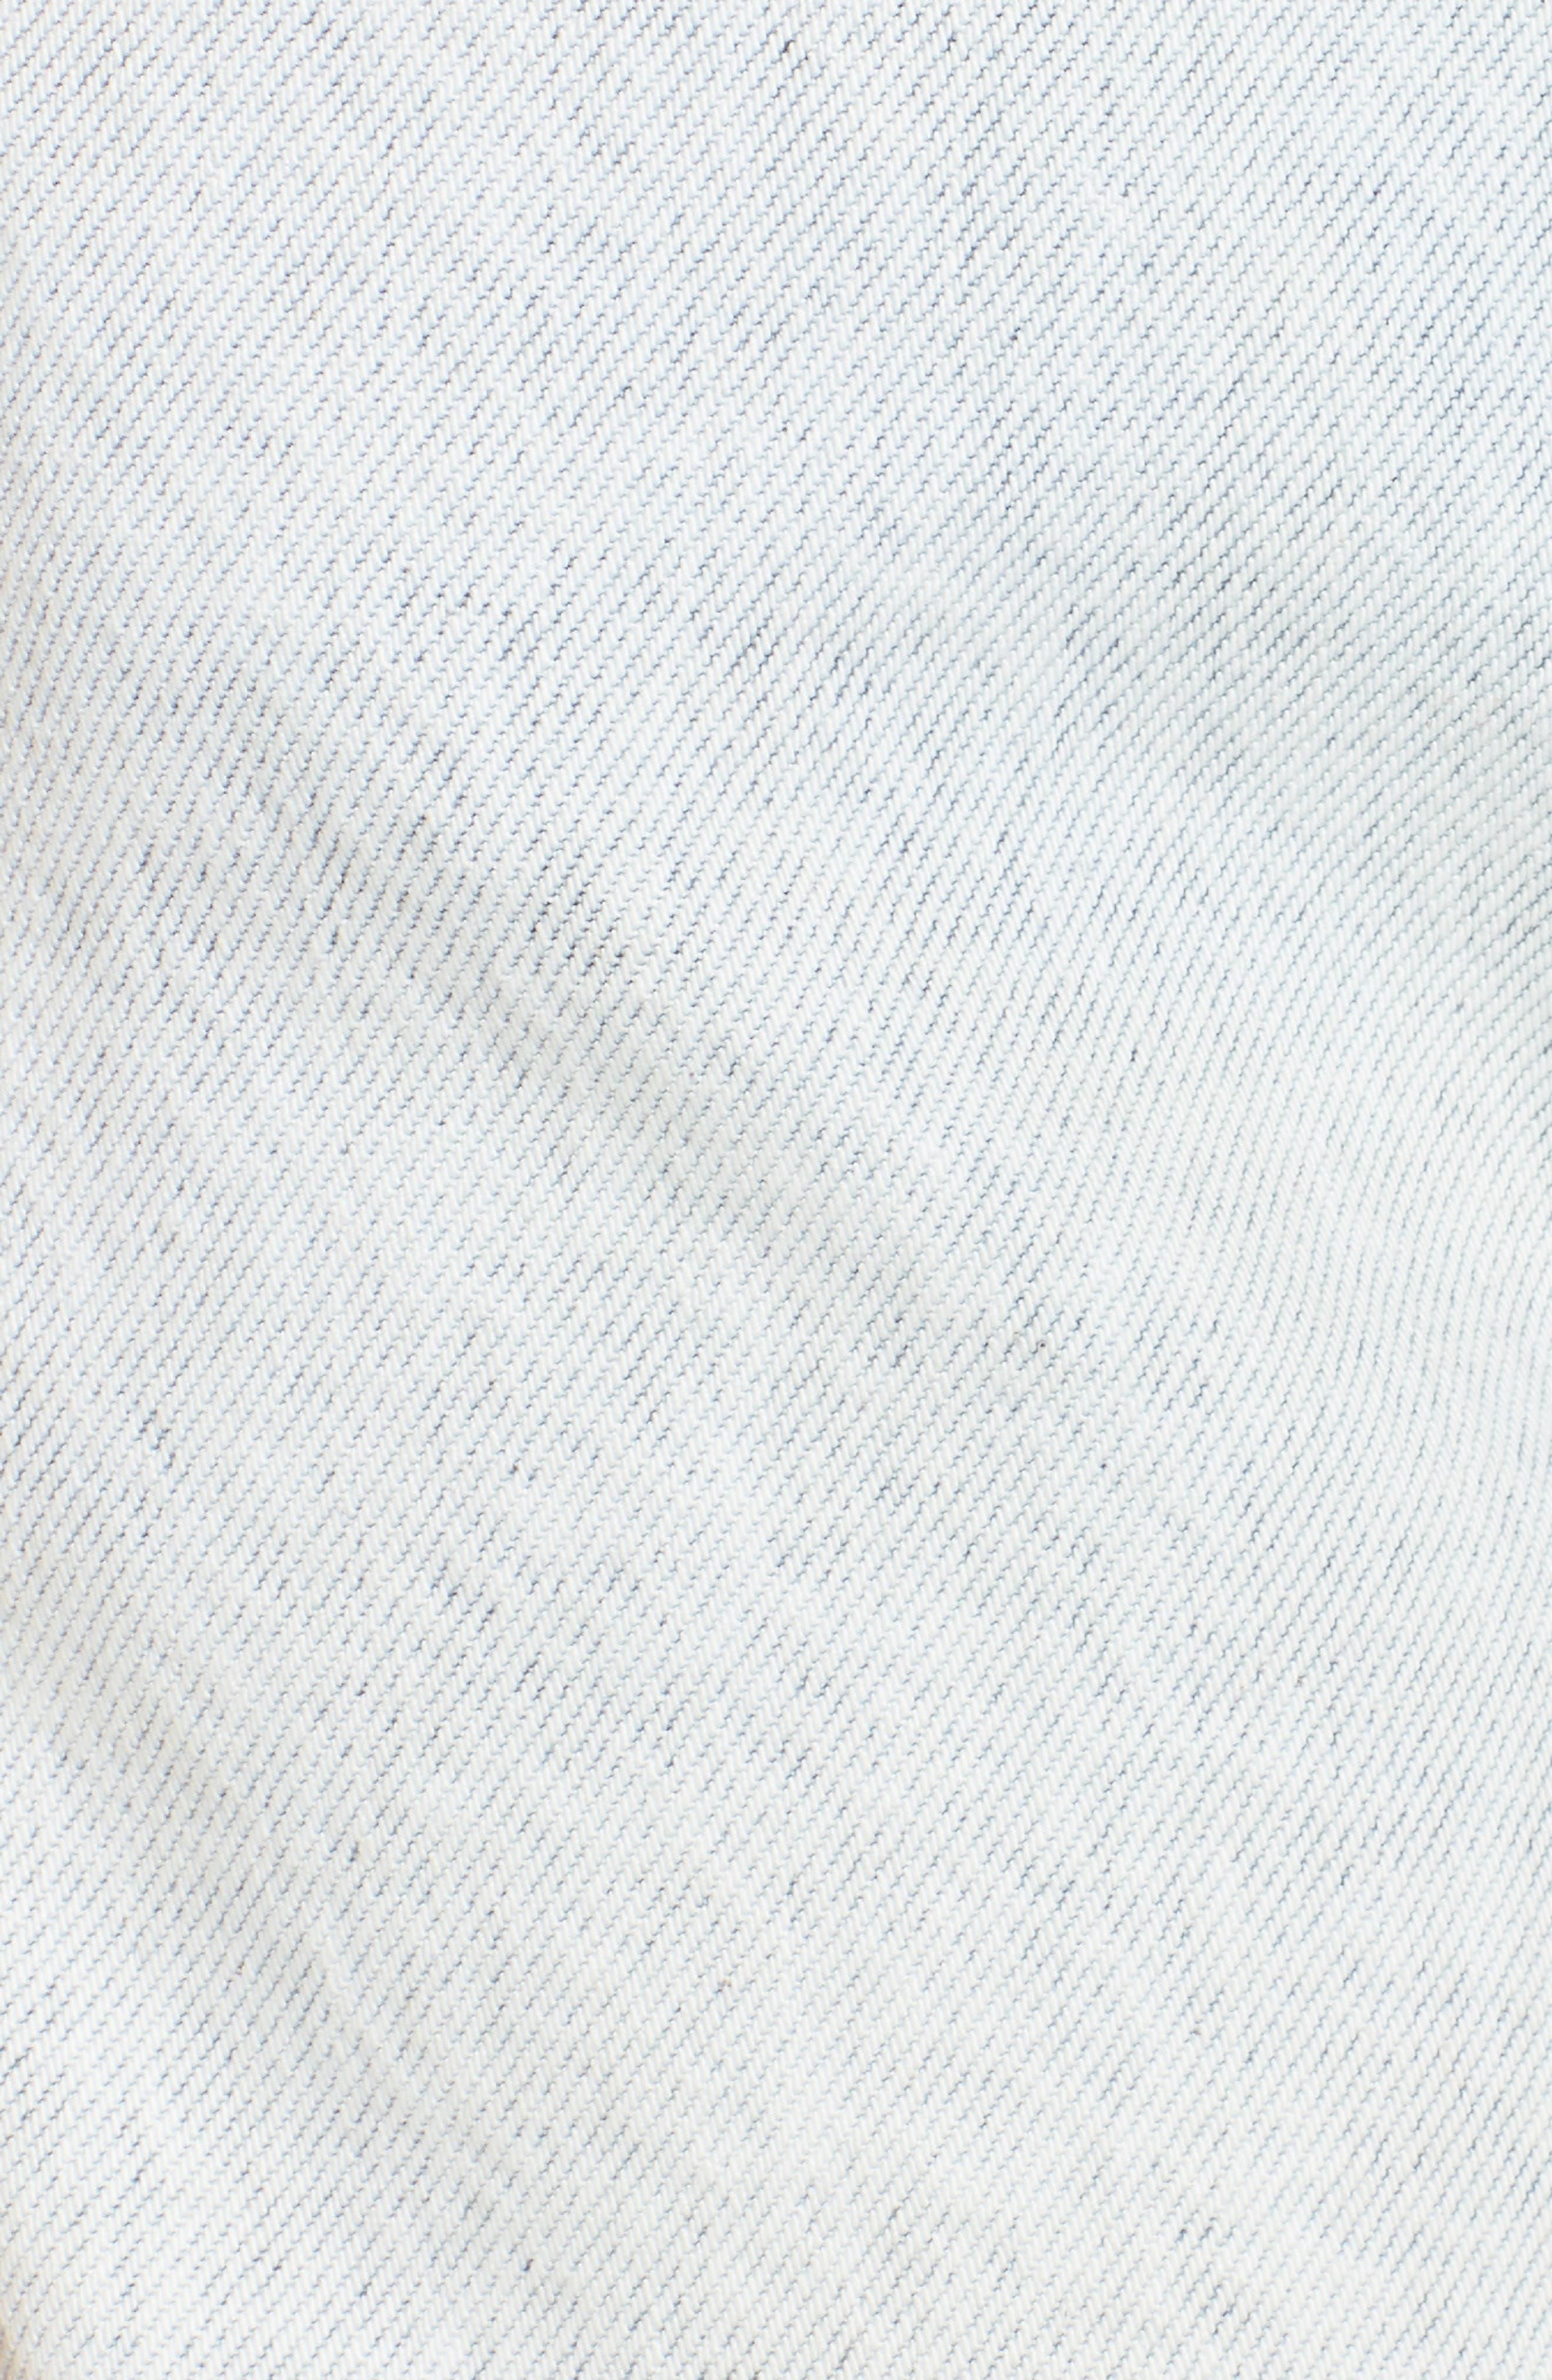 x Margherita Amore Denim Cutoff Shorts,                             Alternate thumbnail 5, color,                             429